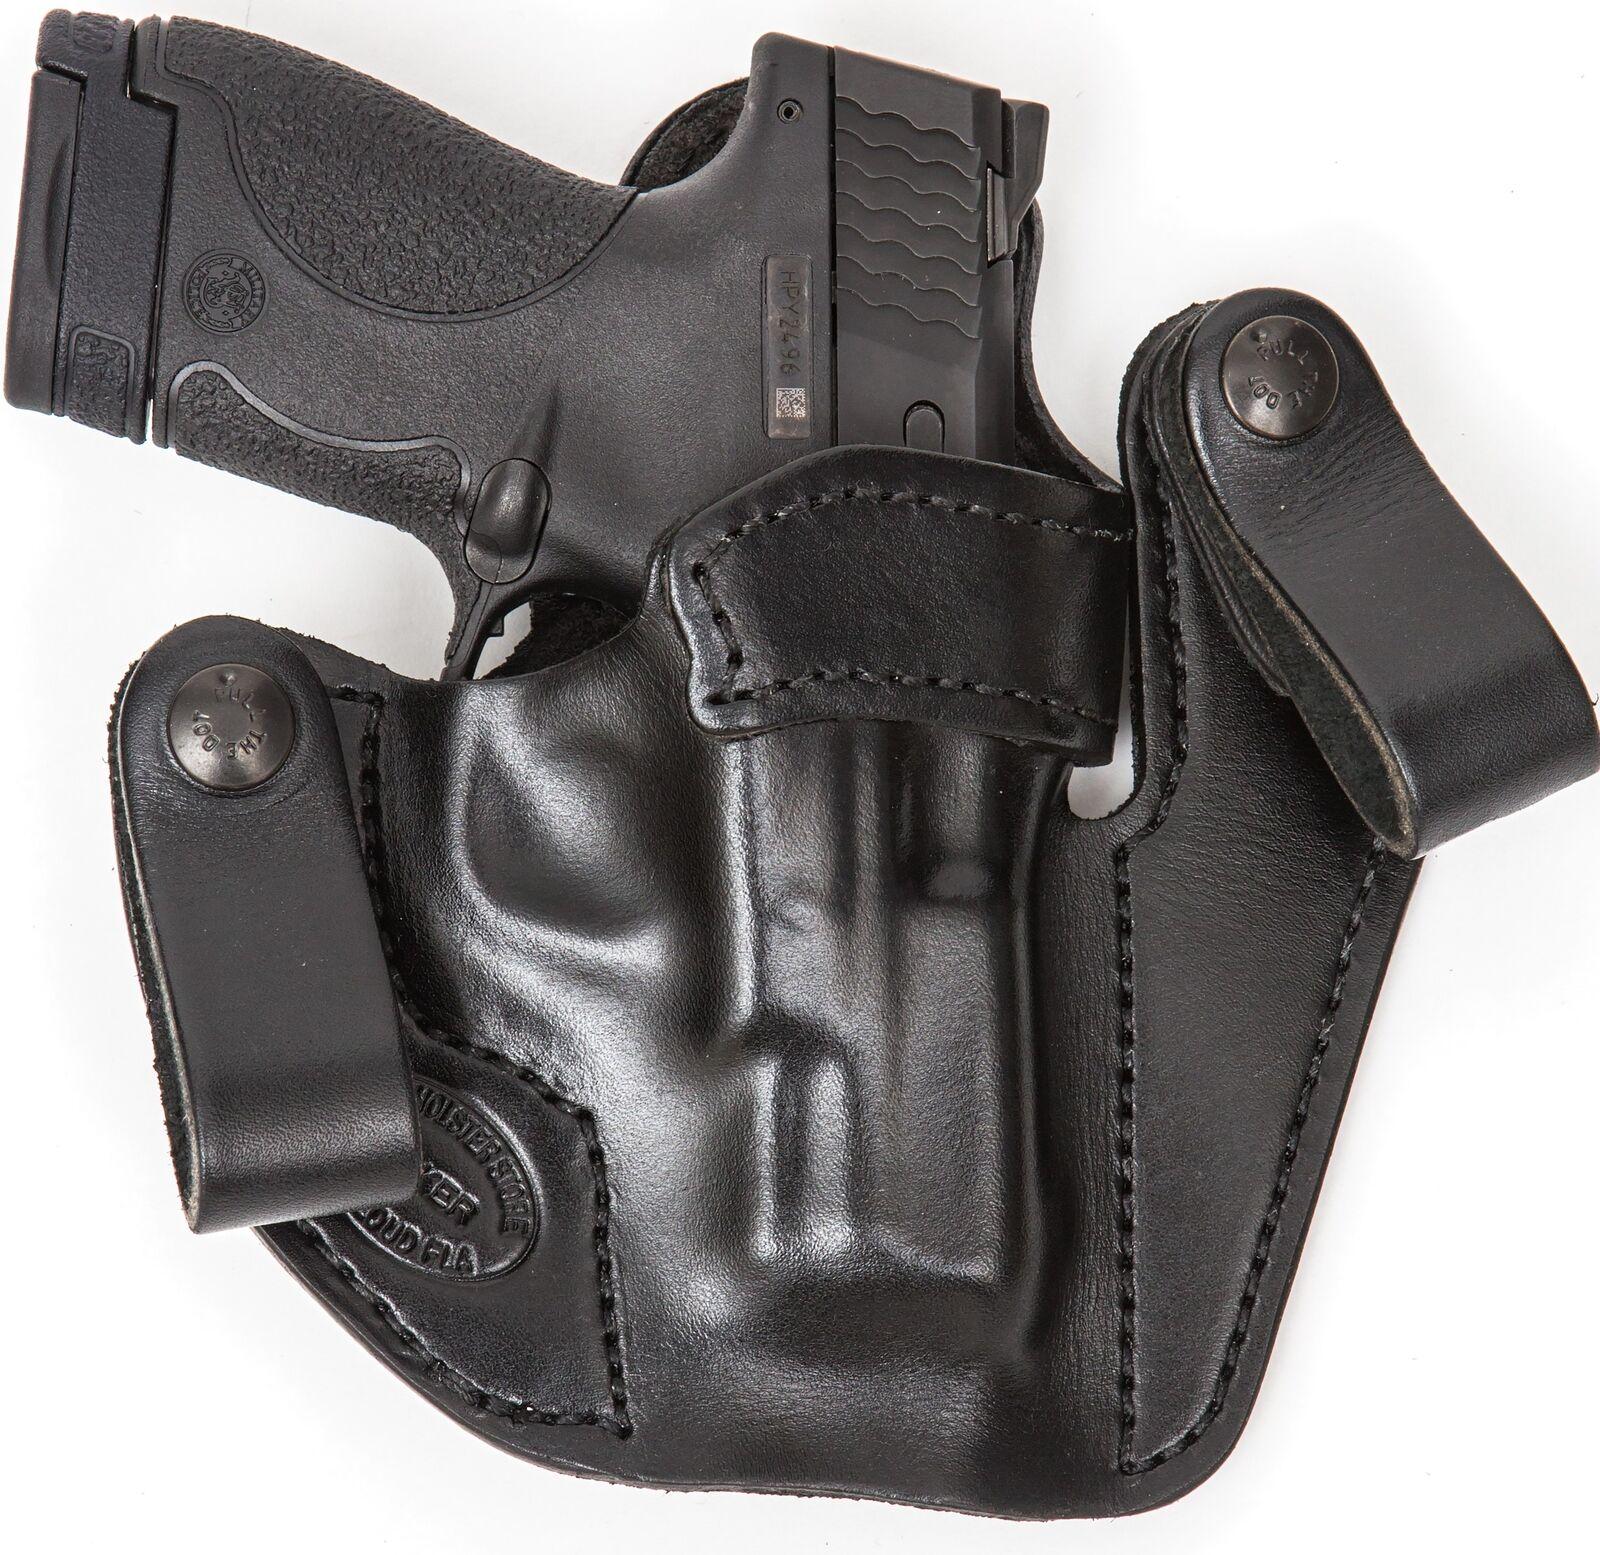 Xtreme llevar RH LH IWB Cuero Funda Pistola Para Ruger P85 P89 P90 P91